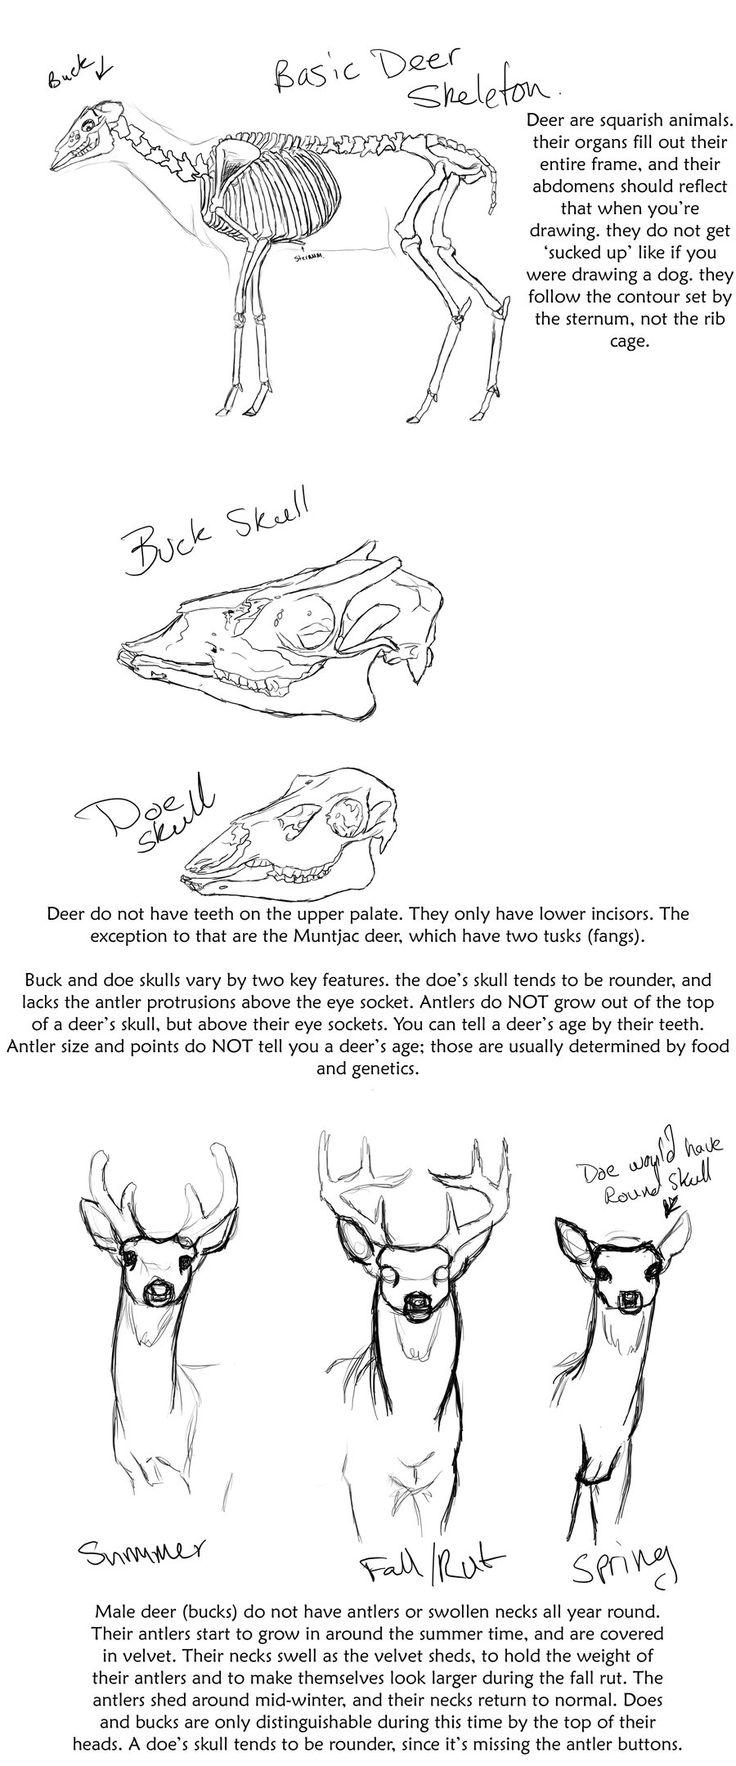 Basic Deer anatomy tutorial by creepygoth666.deviantart.com on @deviantART